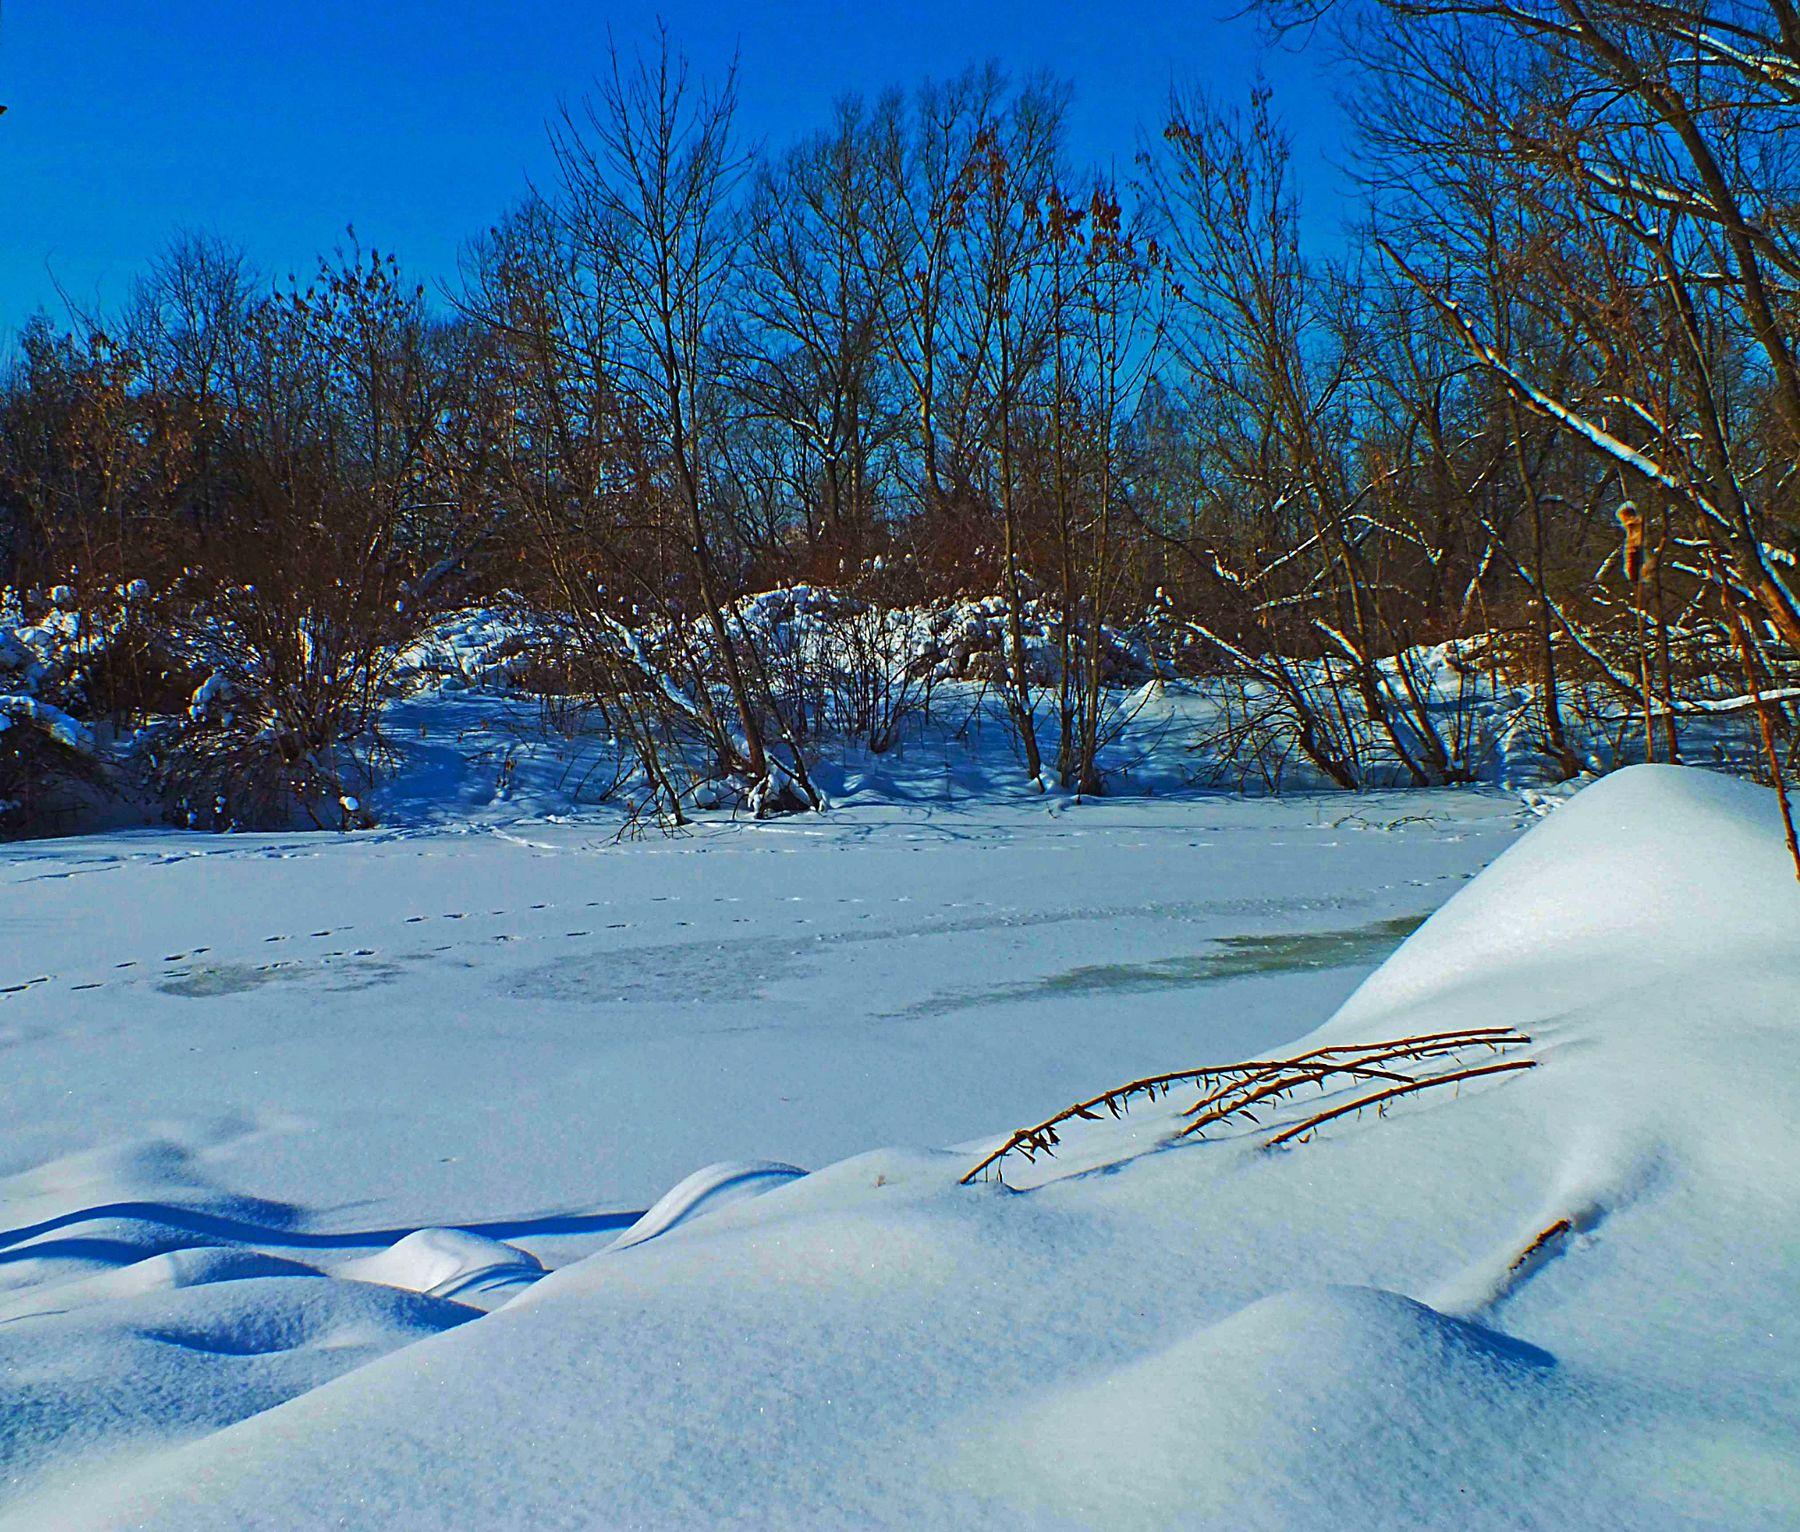 Снежный февраль зима снег мороз